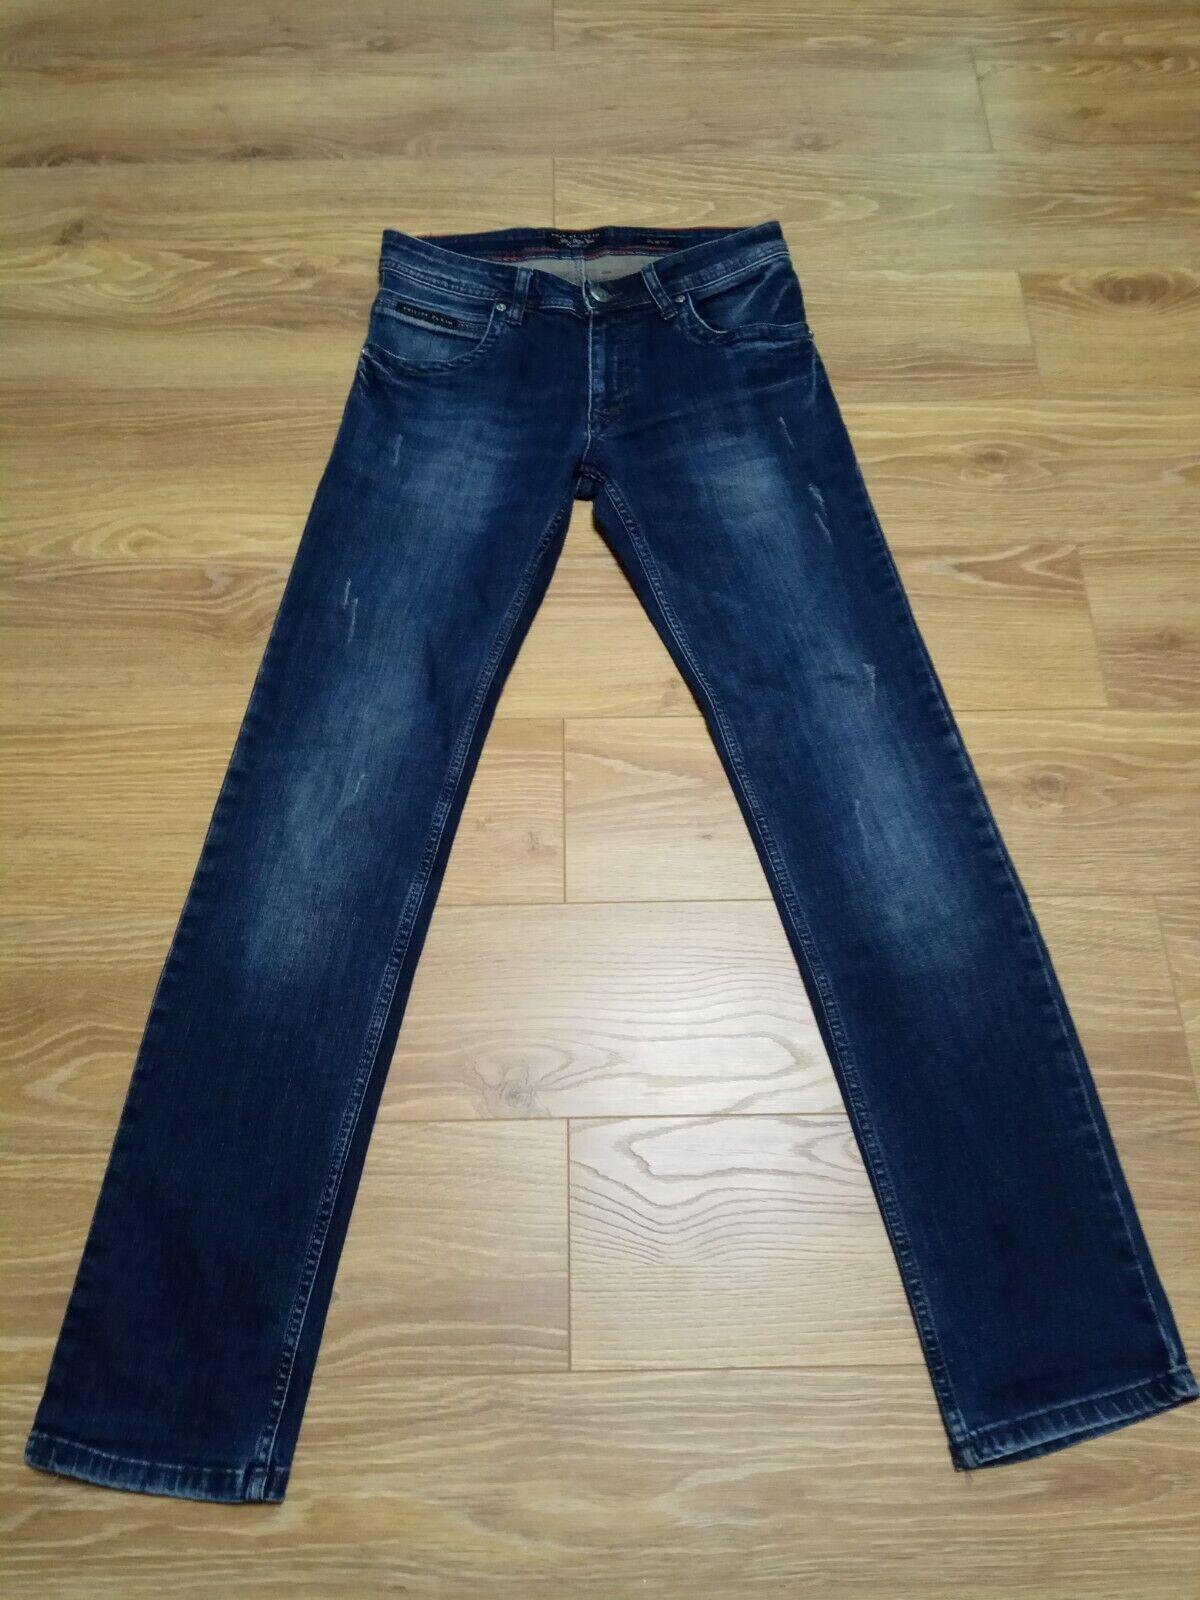 Philipp PLEIN Para Hombre Calce Recto Cut Jeans  Pantalones Slime Talla W30 L34  punto de venta